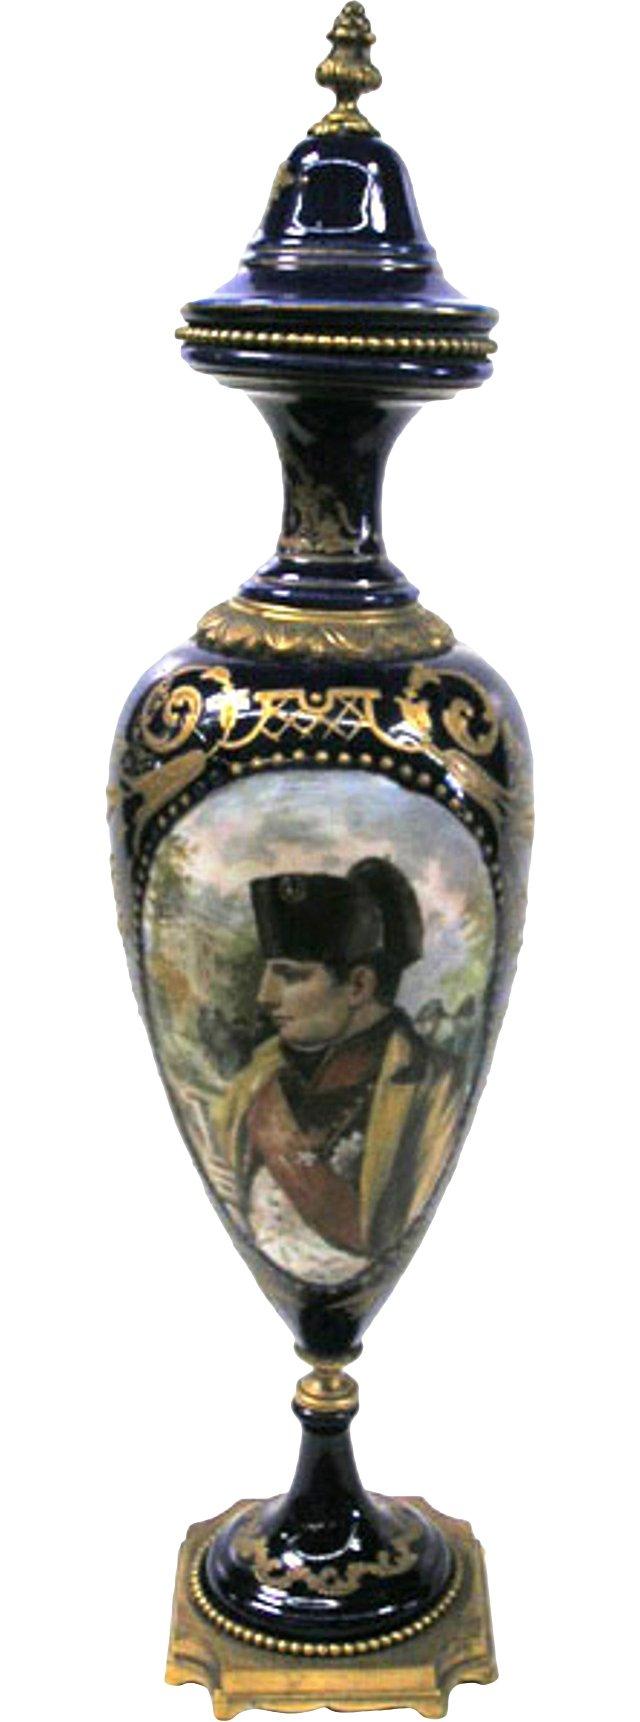 1900s French Napoleon Porcelain Urn